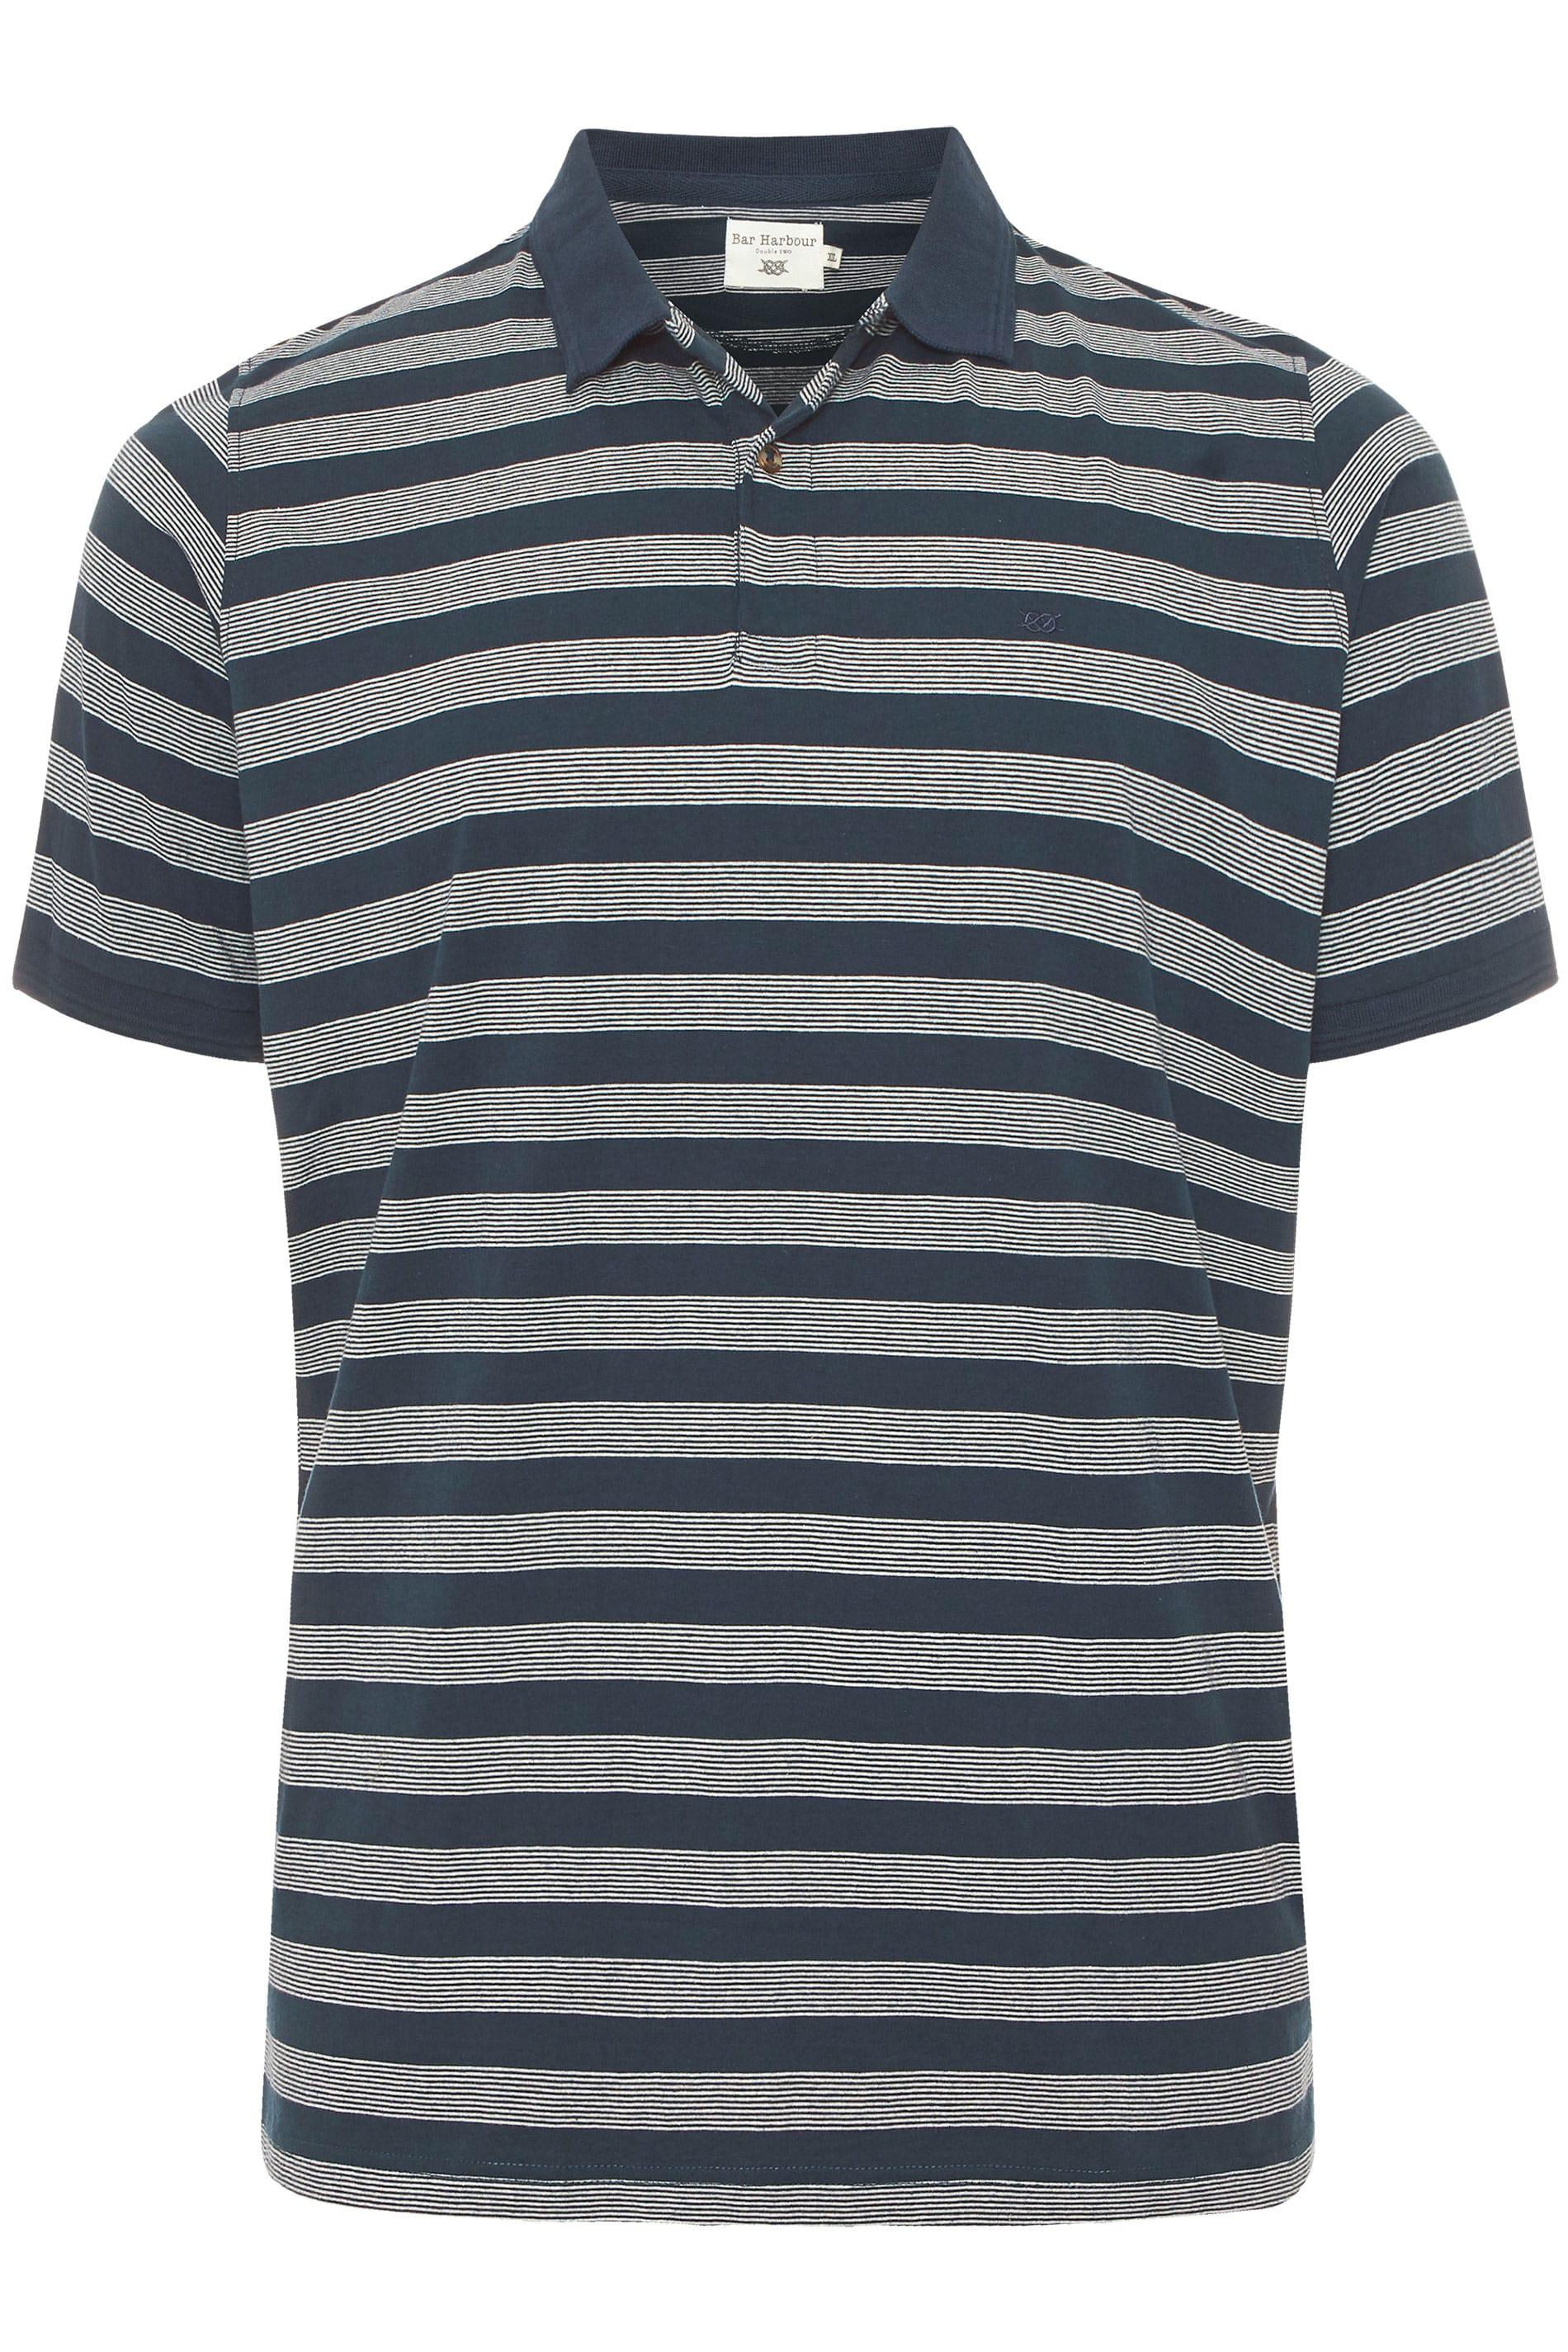 BAR HARBOUR Navy Stripe Polo Shirt